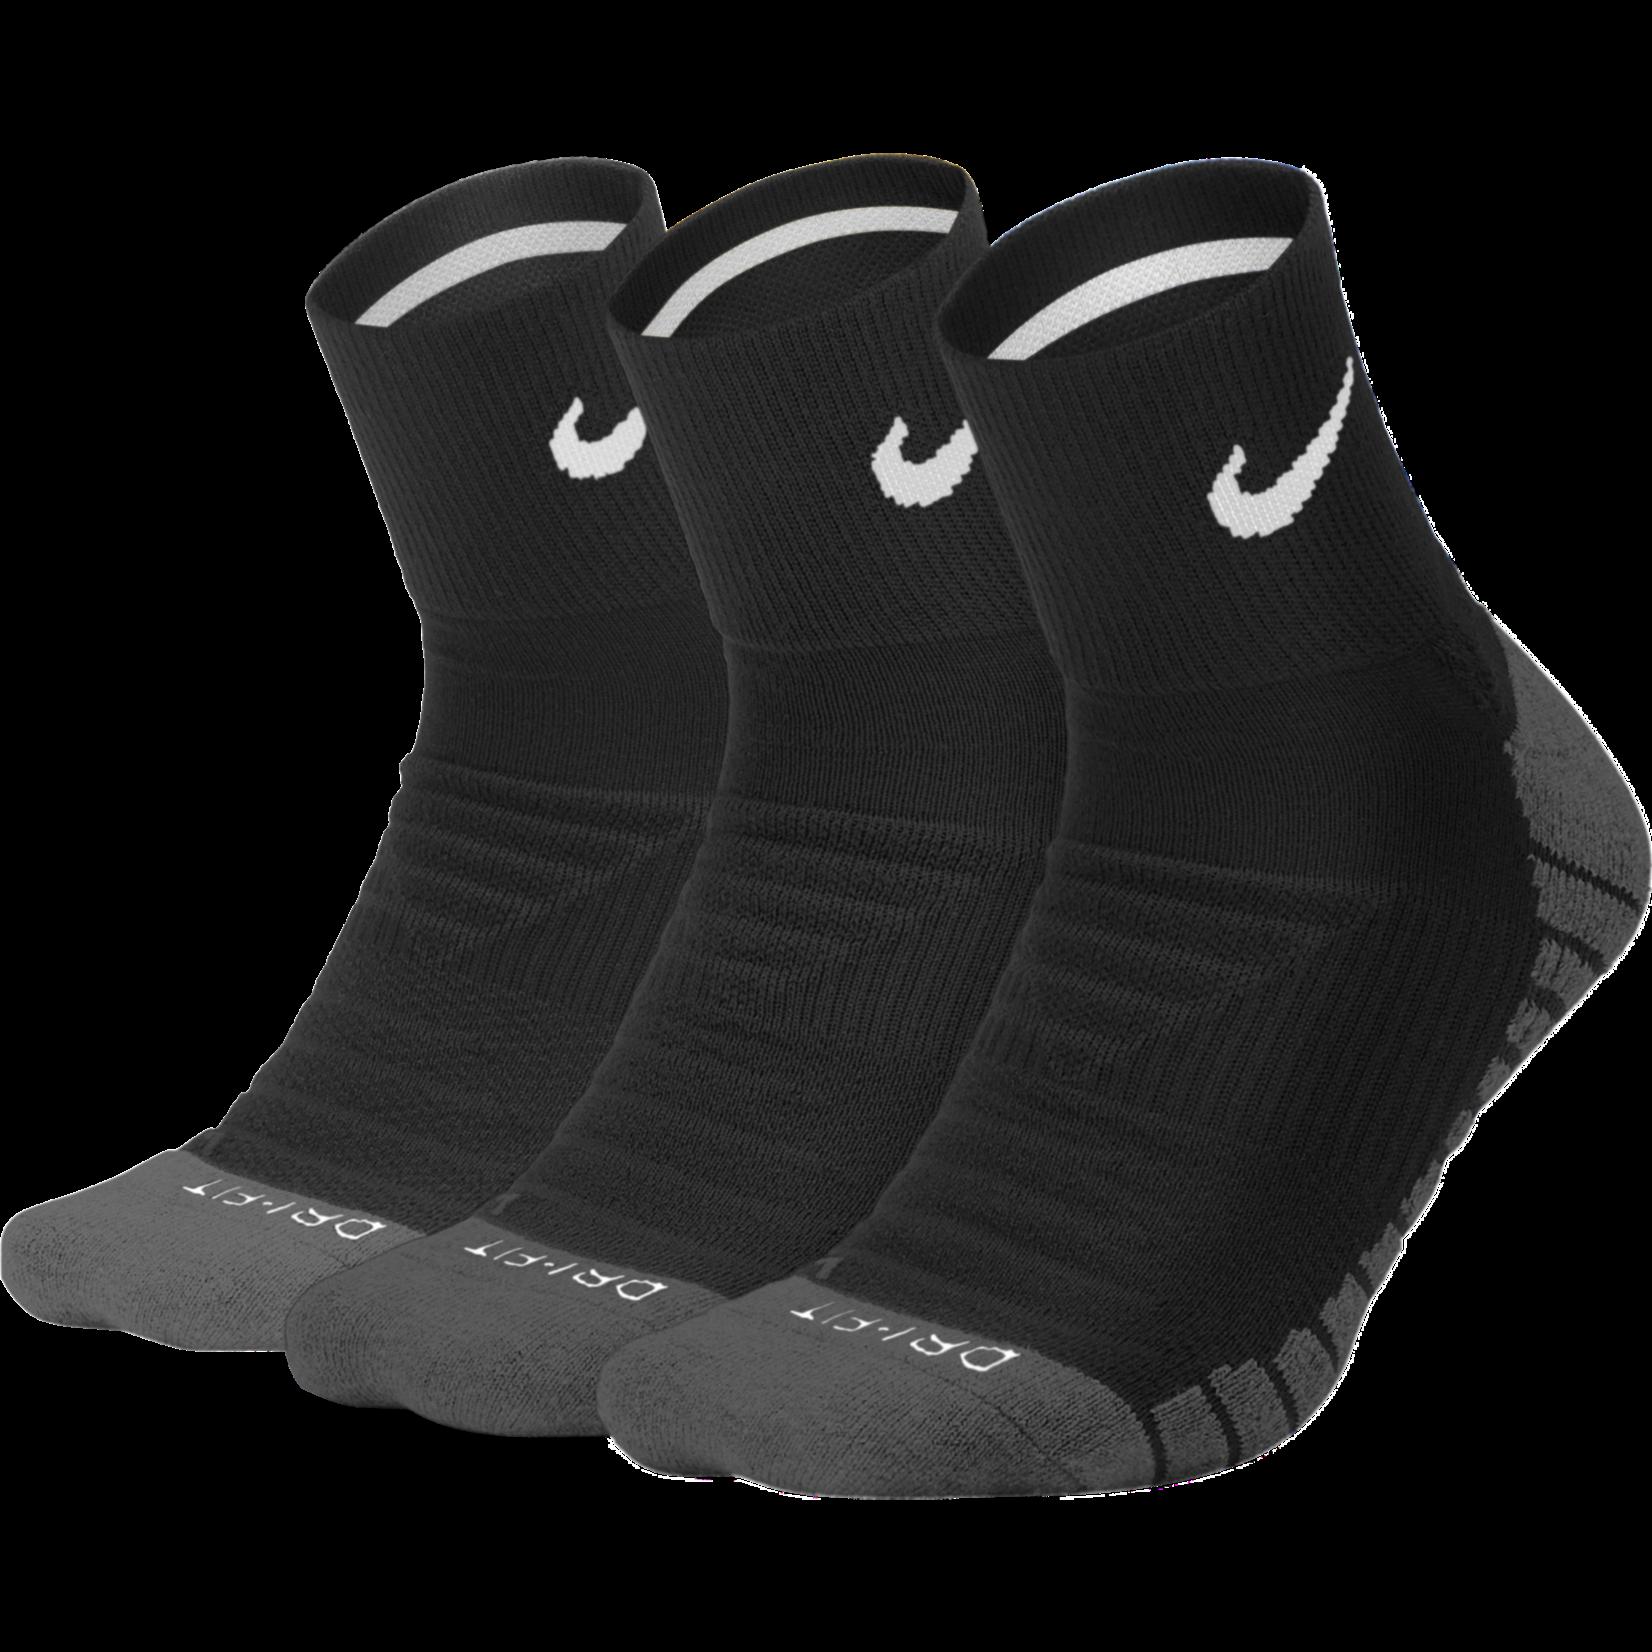 Nike Unisex Nike Everyday Max Cushion Ankle Training Sock (3 paar)